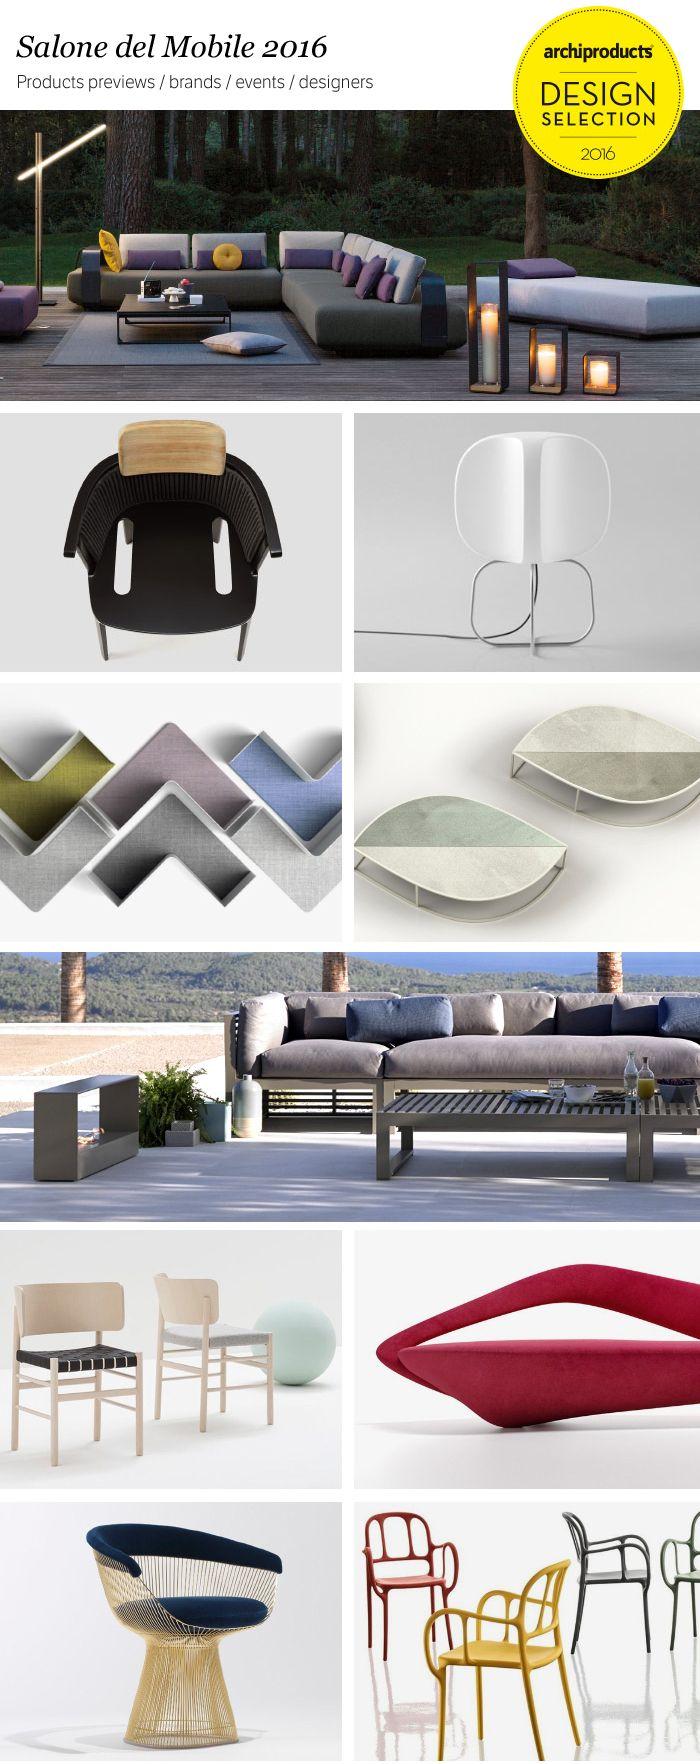 FontanaArte Rediscovers The Splendor Of Glass And Metal